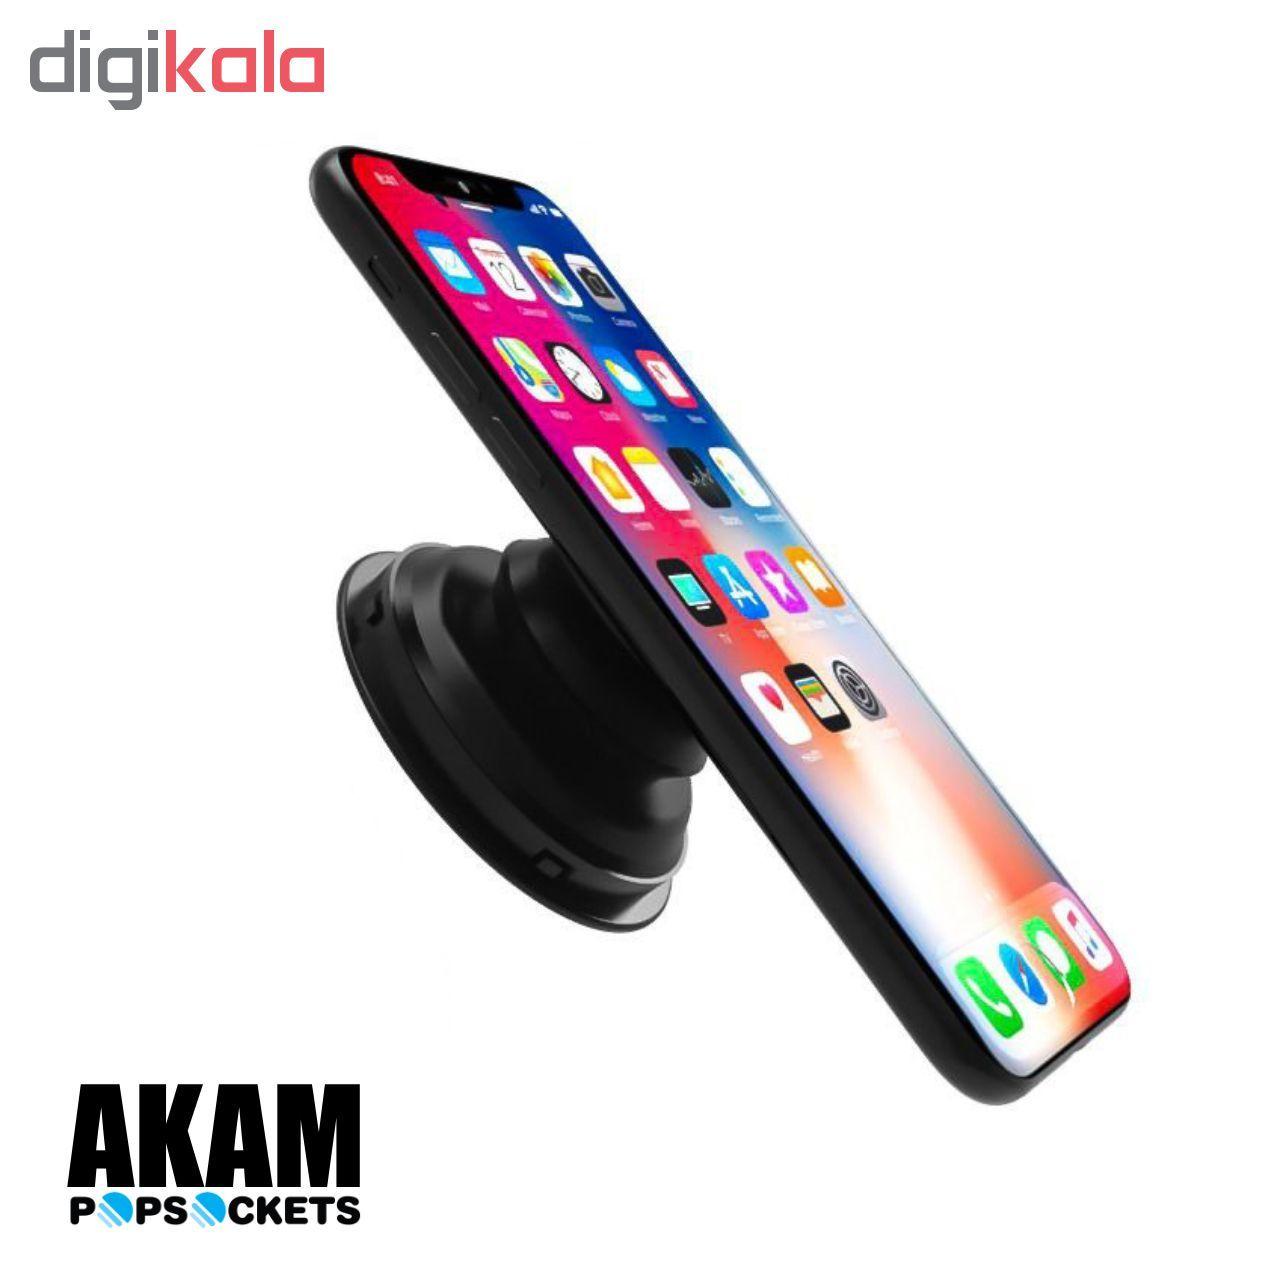 پایه نگهدارنده گوشی موبایل پاپ سوکت آکام مدل APS0163 main 1 6